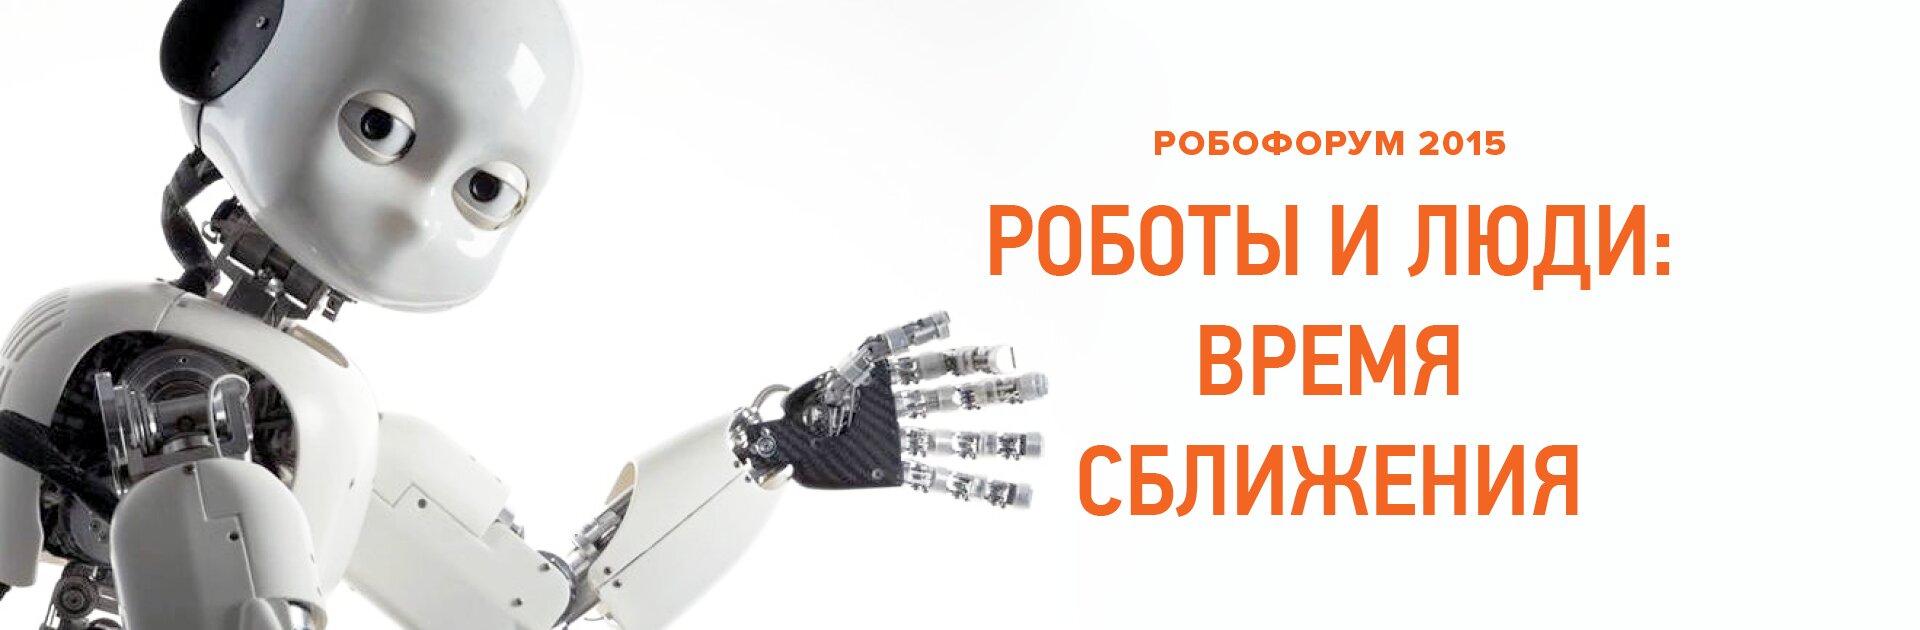 mosroboforum.ru